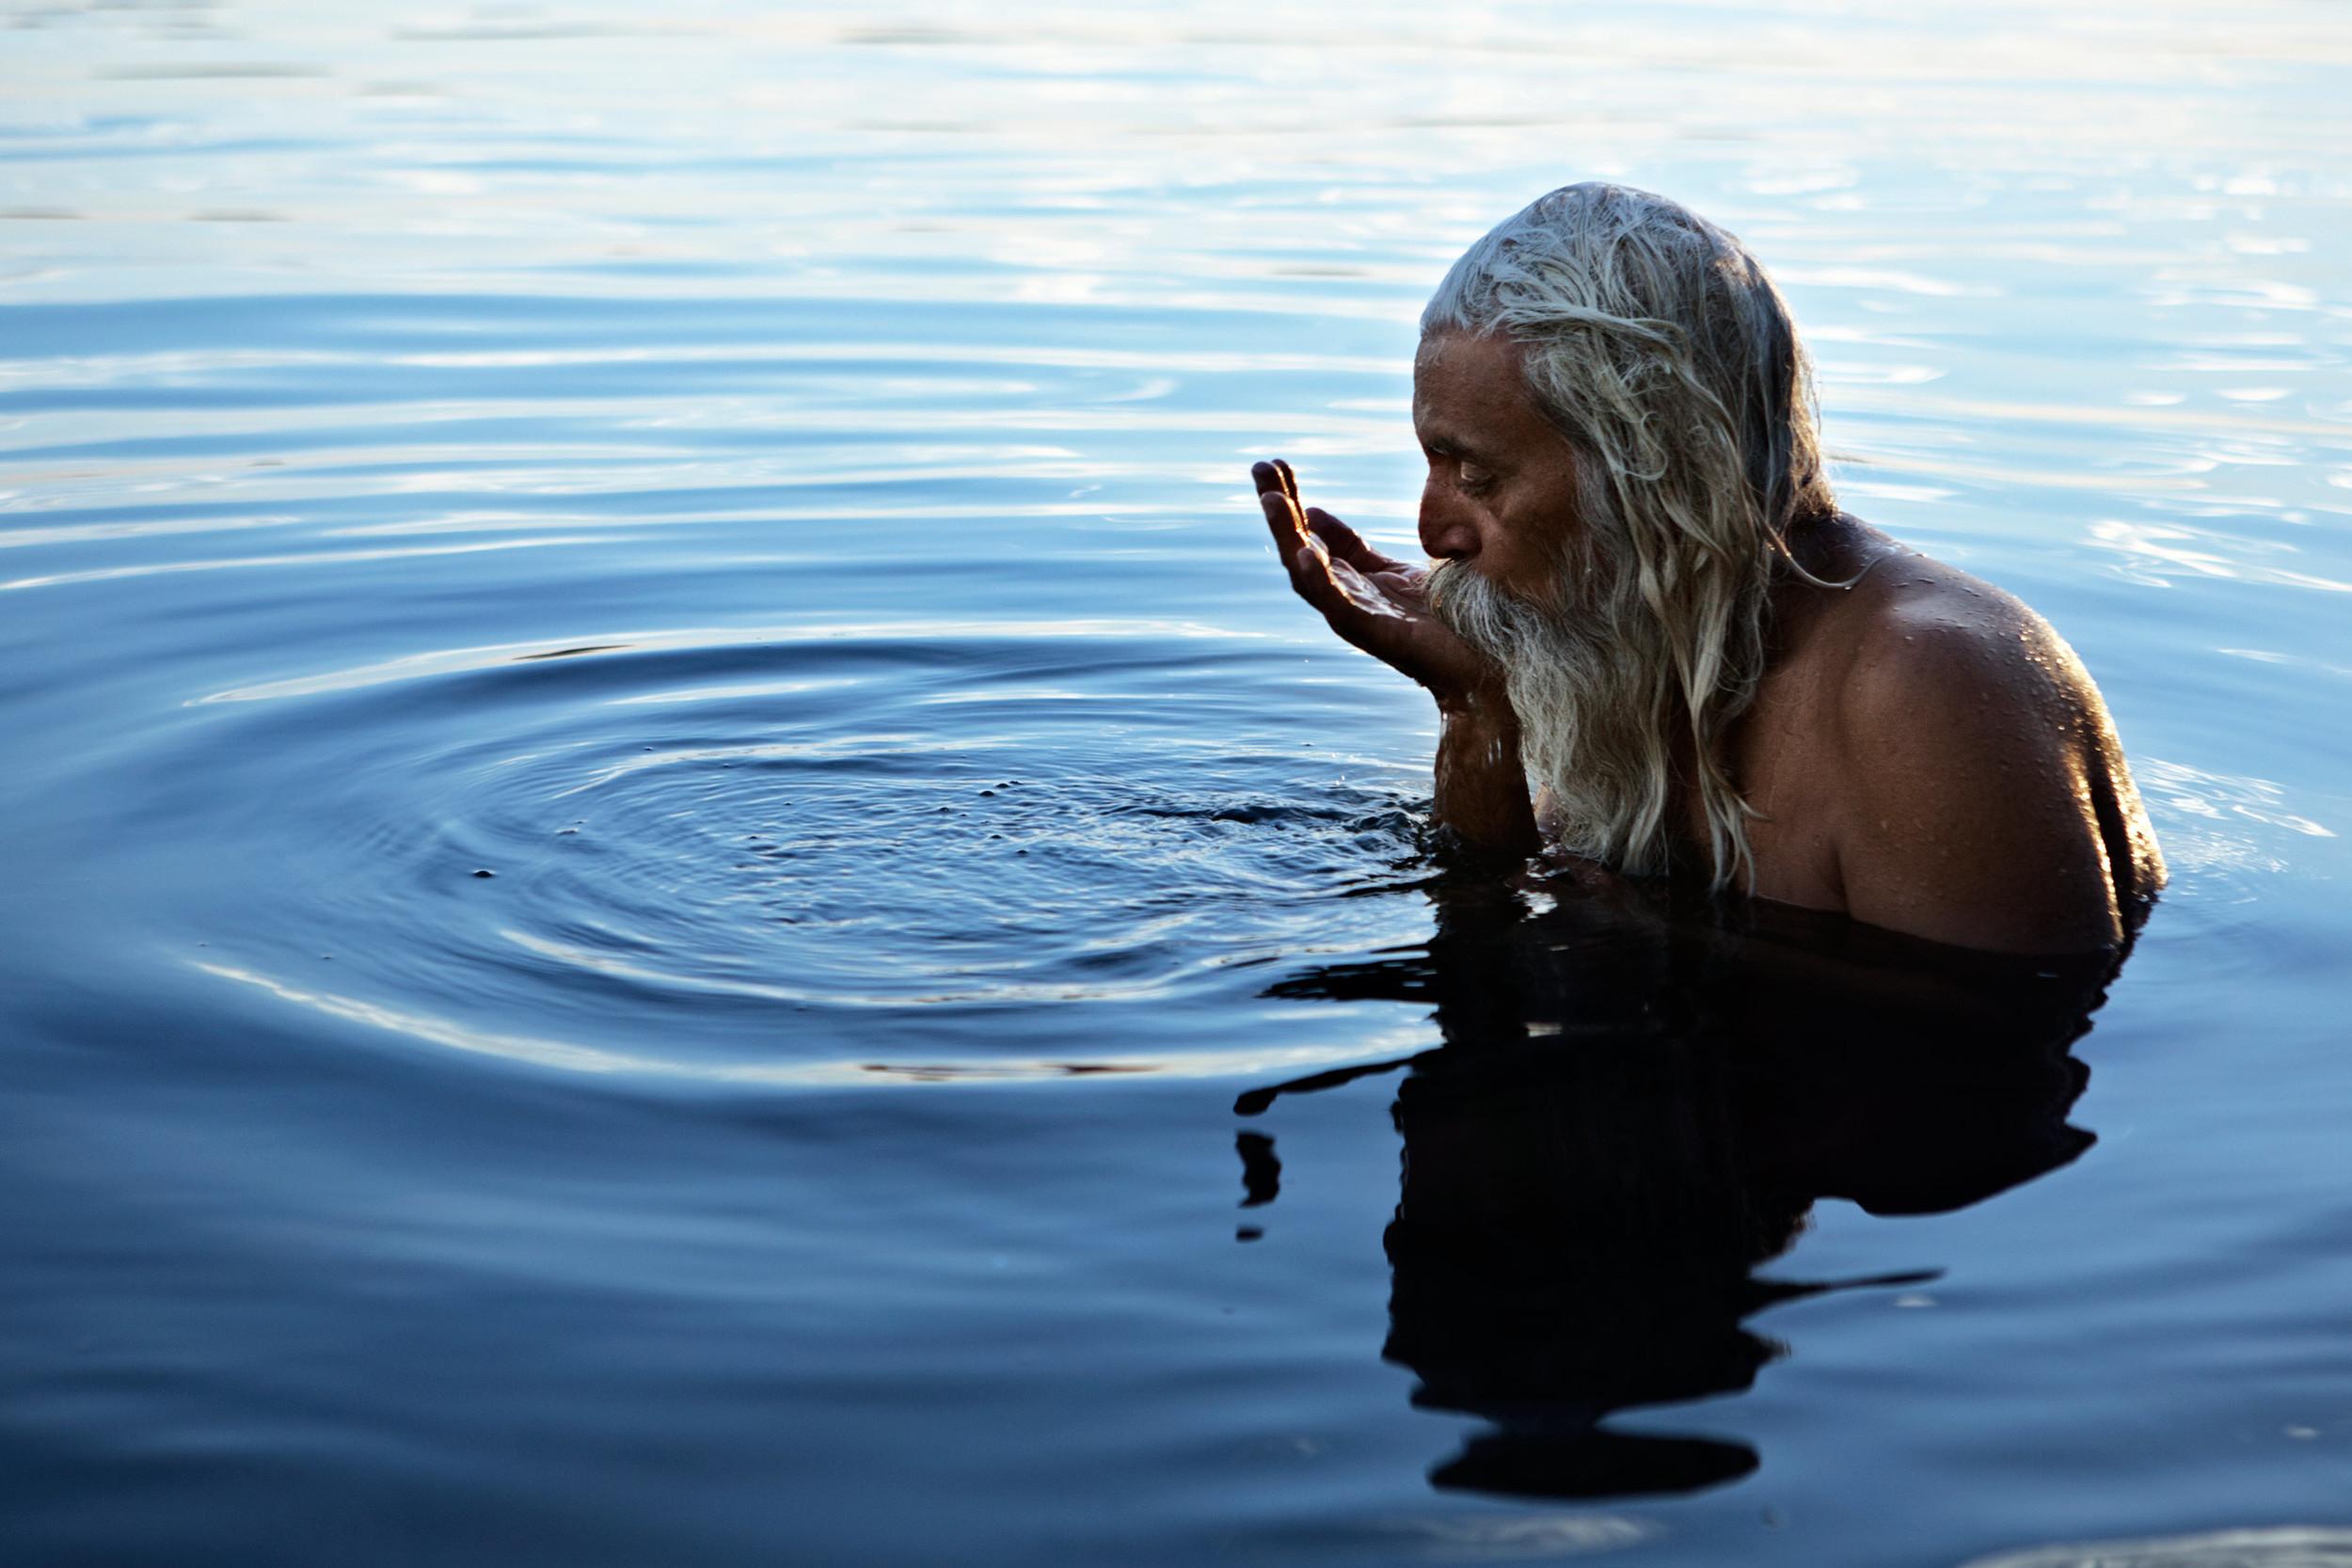 Hindu holyman bathing and drinking from the Narmada